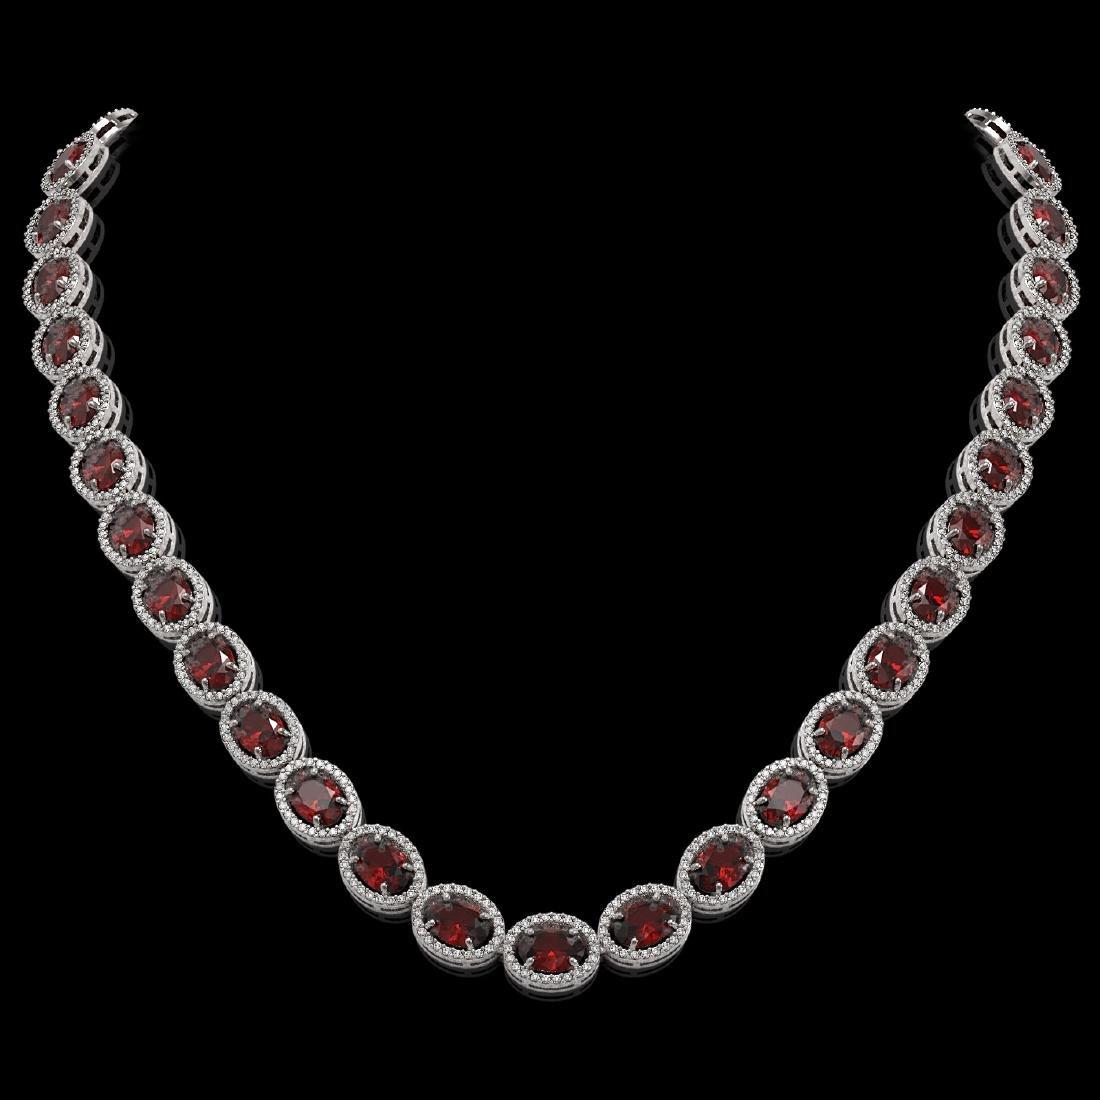 50.08 CTW Garnet & Diamond Halo Necklace 10K White Gold